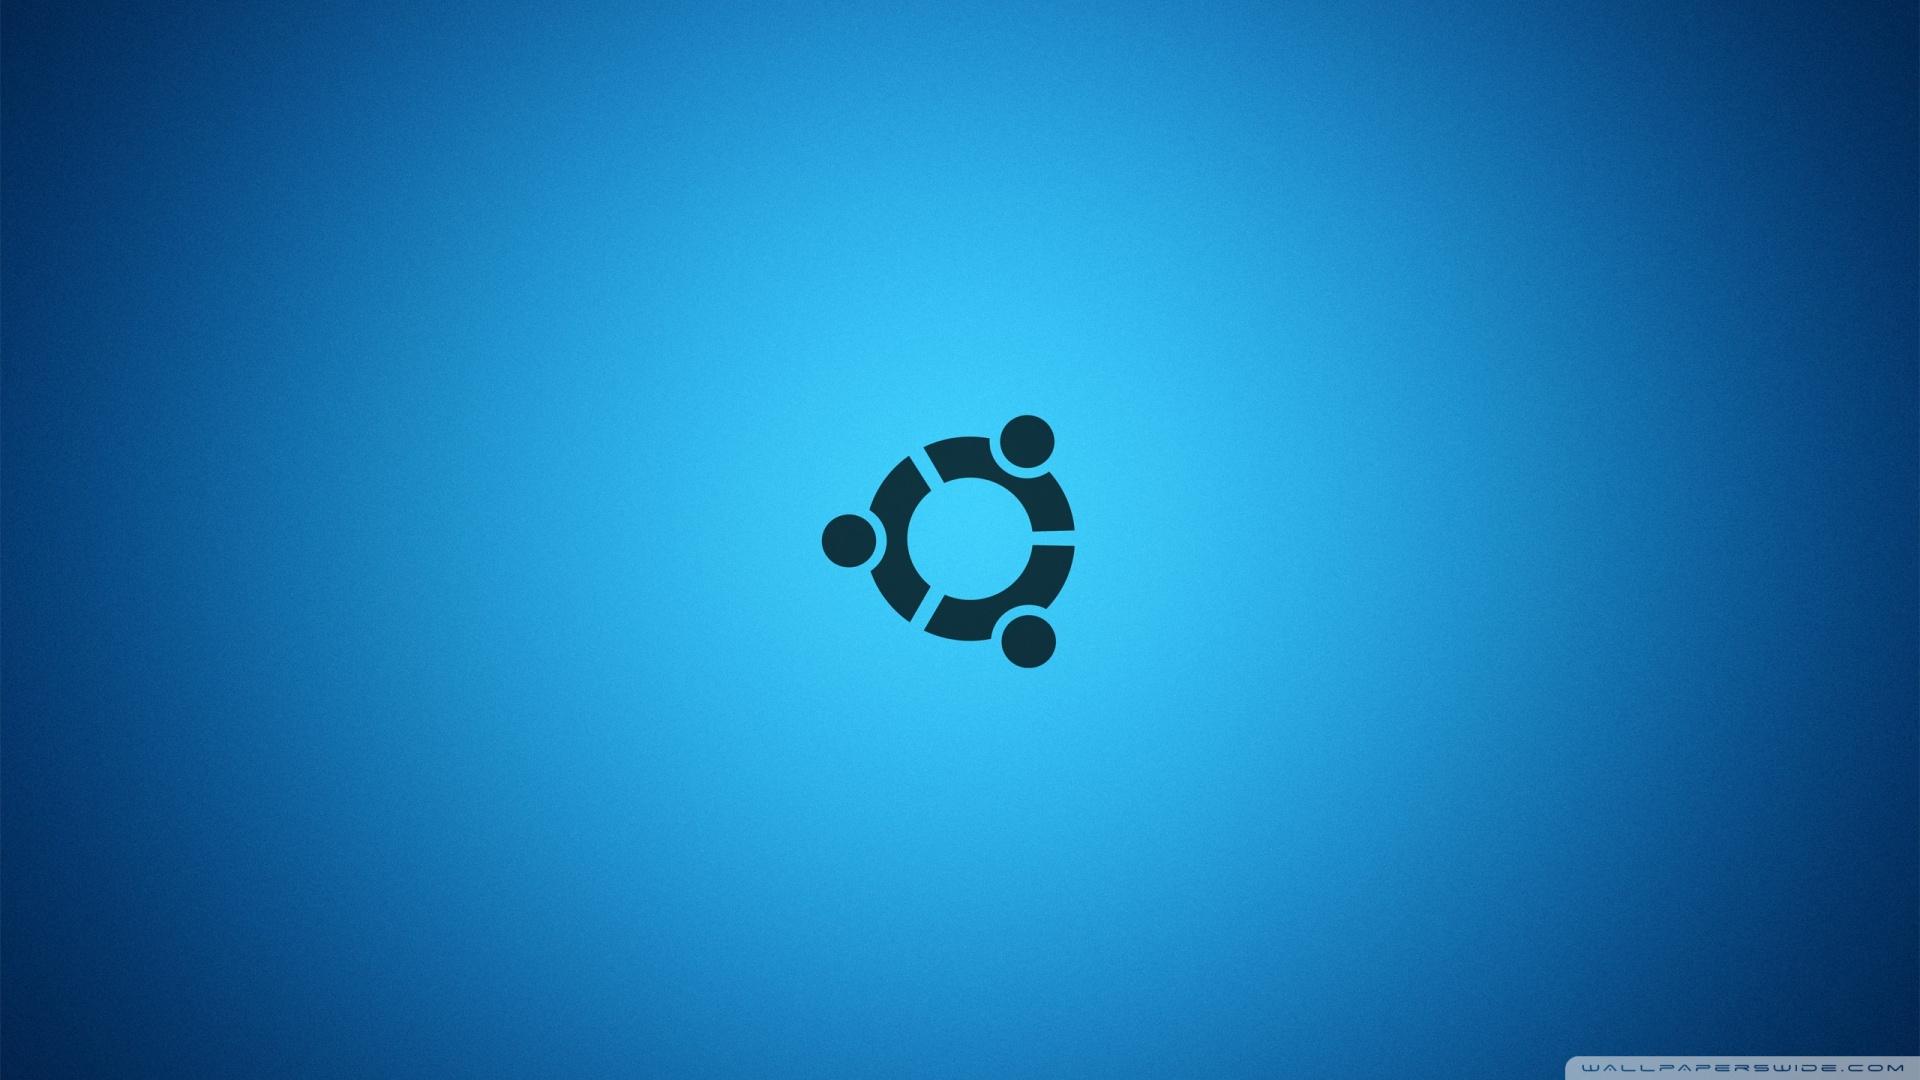 Cool Ubuntu Background 1864   HDWPro 1920x1080